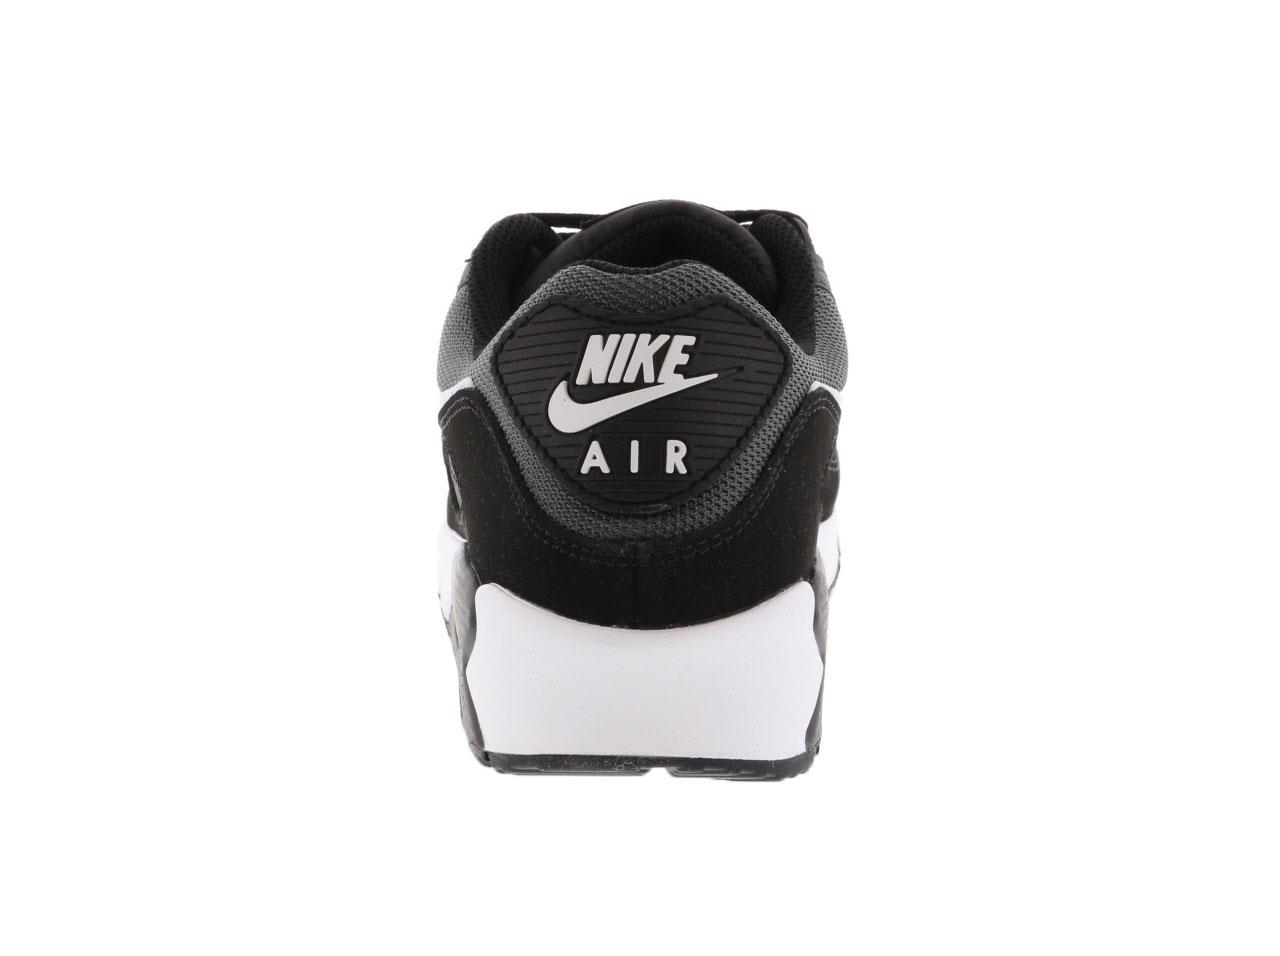 【SALE】NIKE AIR MAX 90 - IRON GREY